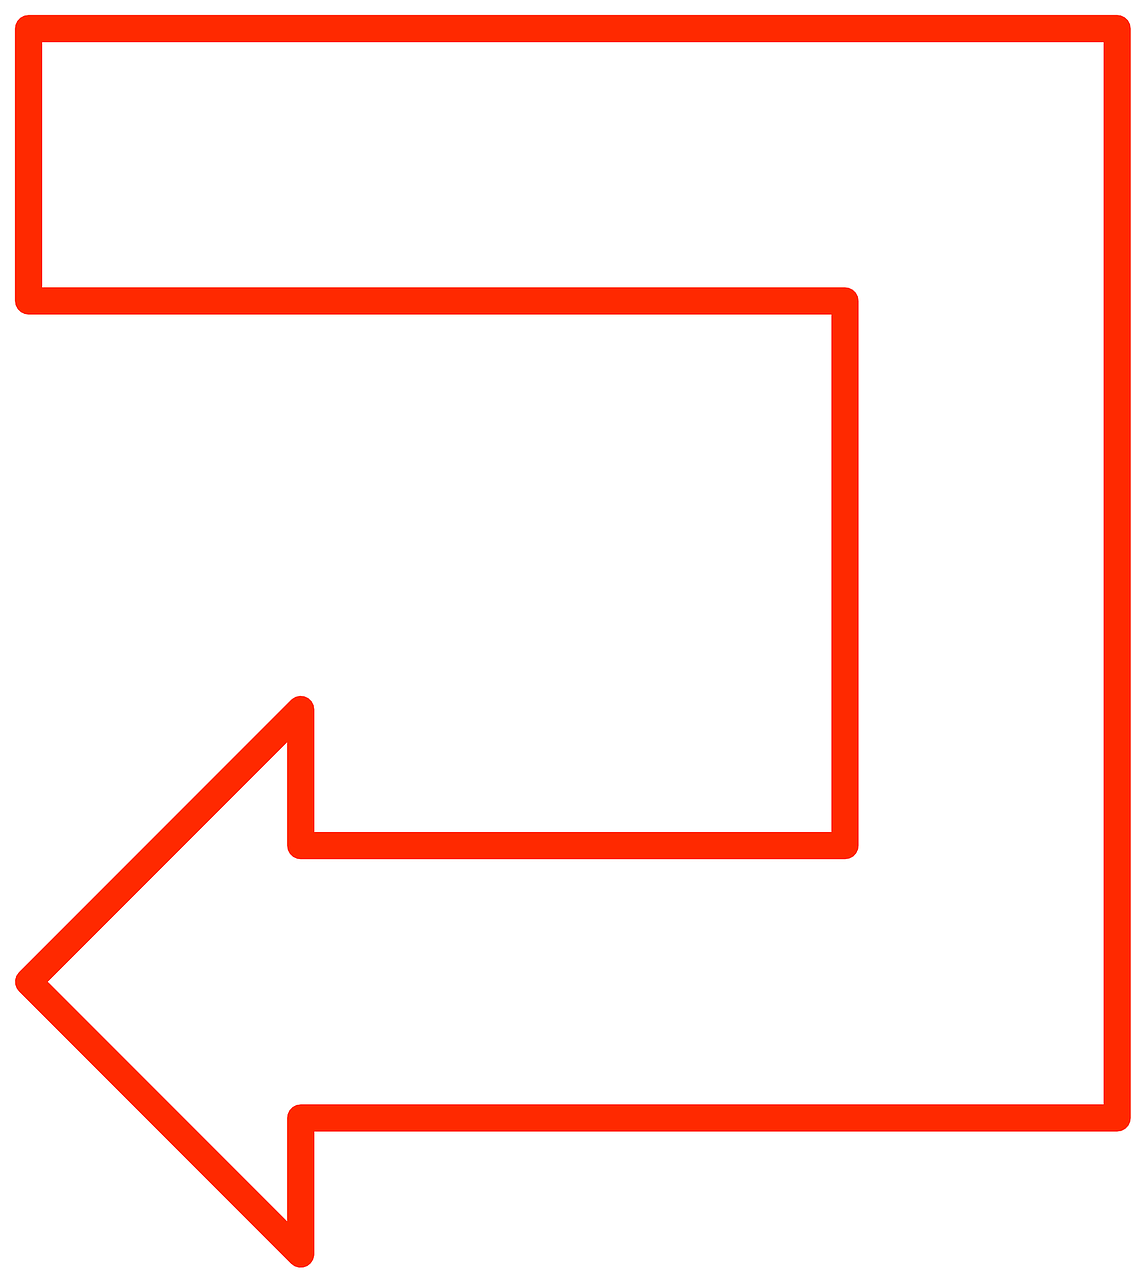 1143x1280 Arrow, Flowchart, Symbol, Flow Chart, Drawing